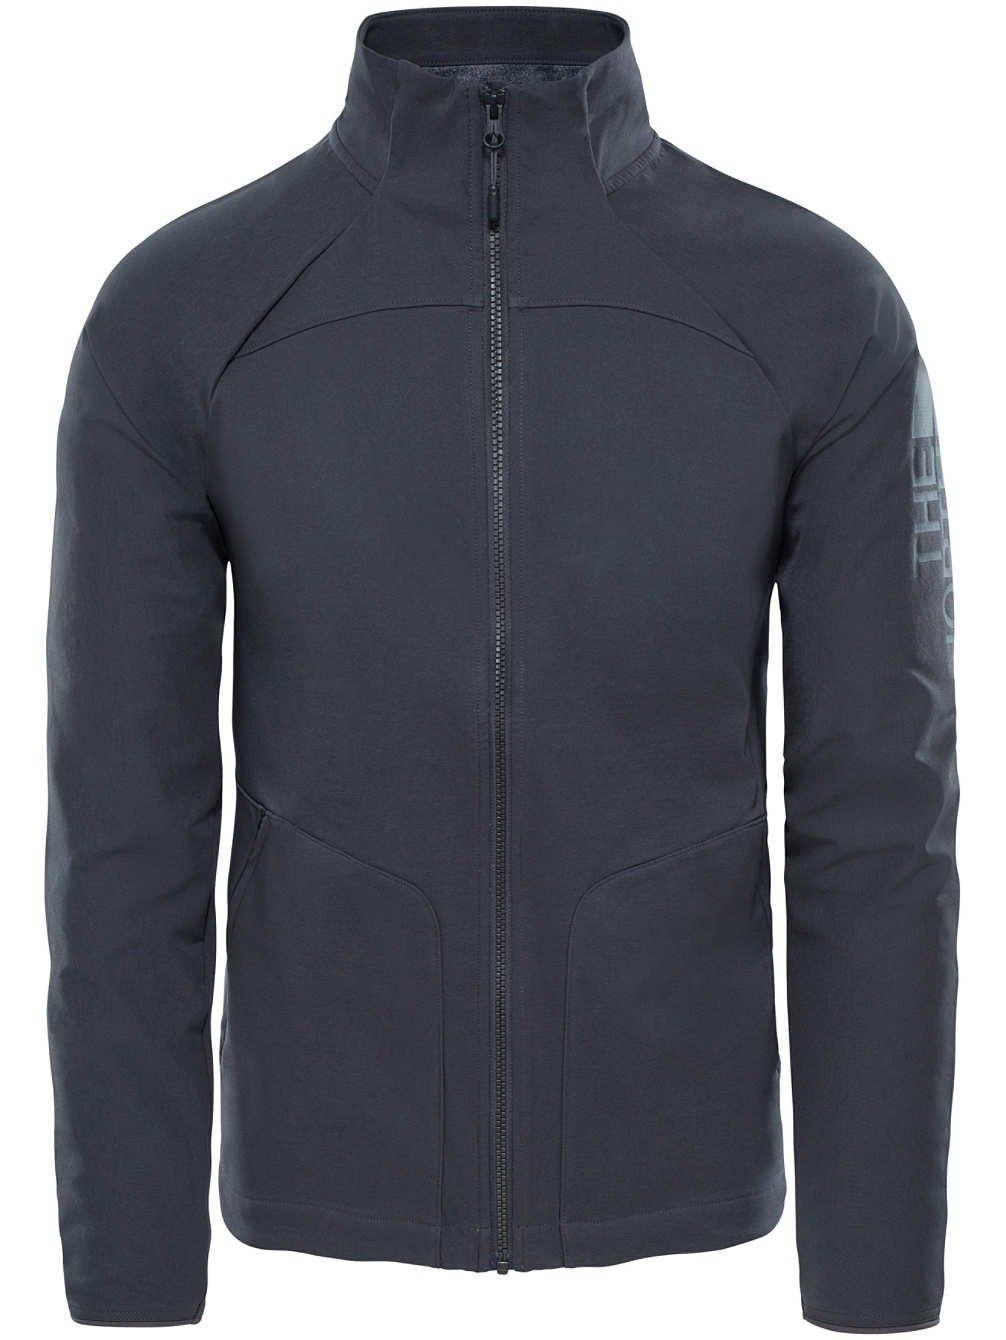 THE NORTH FACE M Ondras STSL Jacket, Sweatshirt